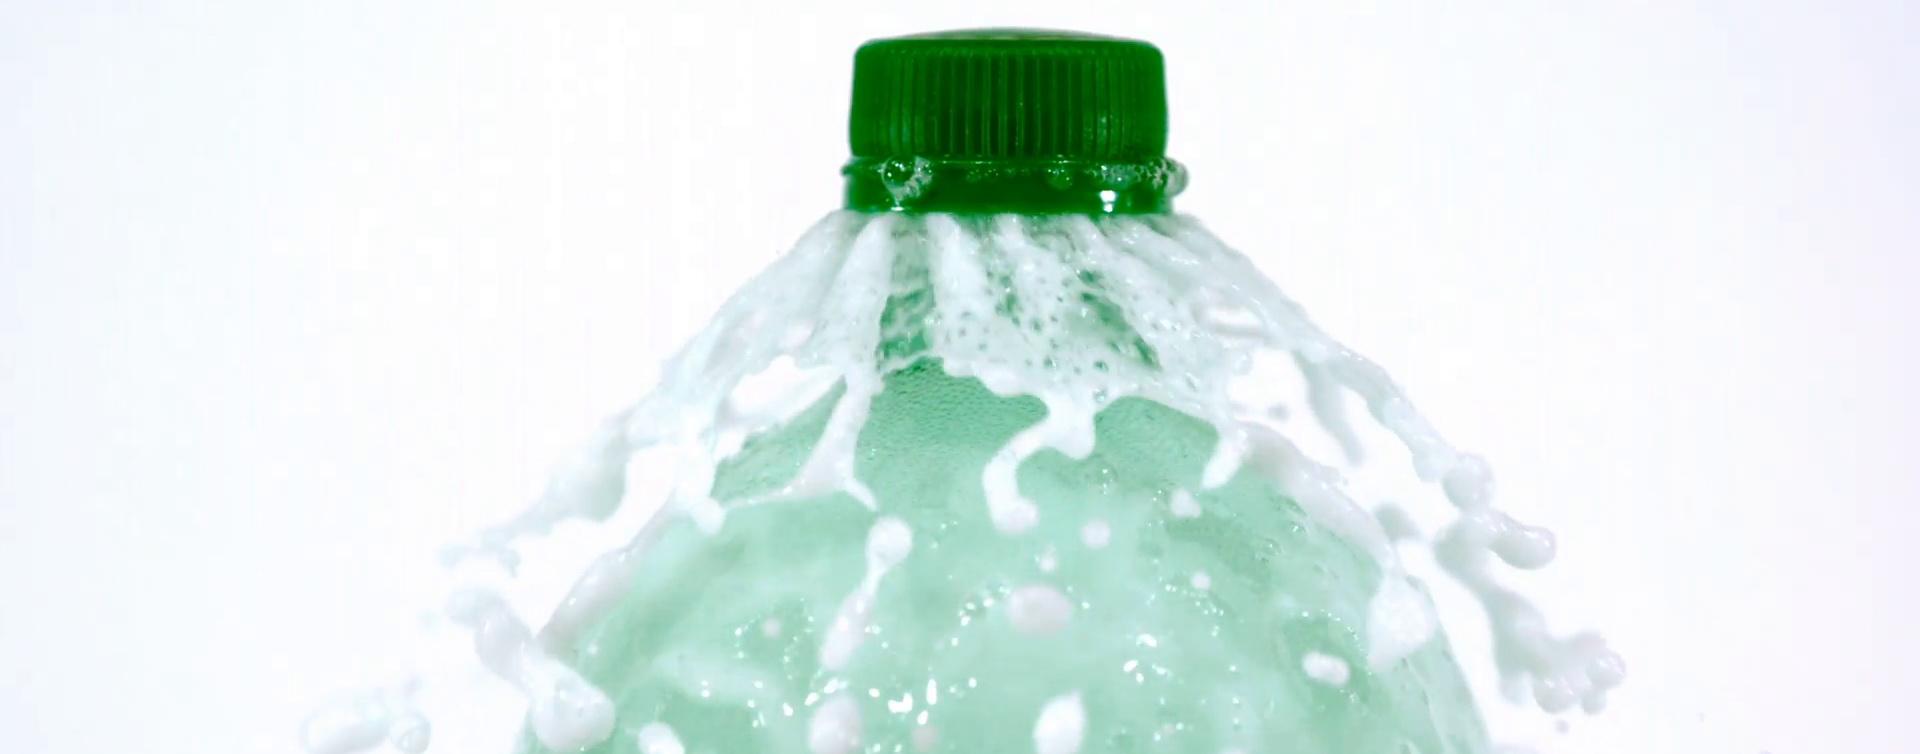 آبمیوه تتراپک و آب معدنی